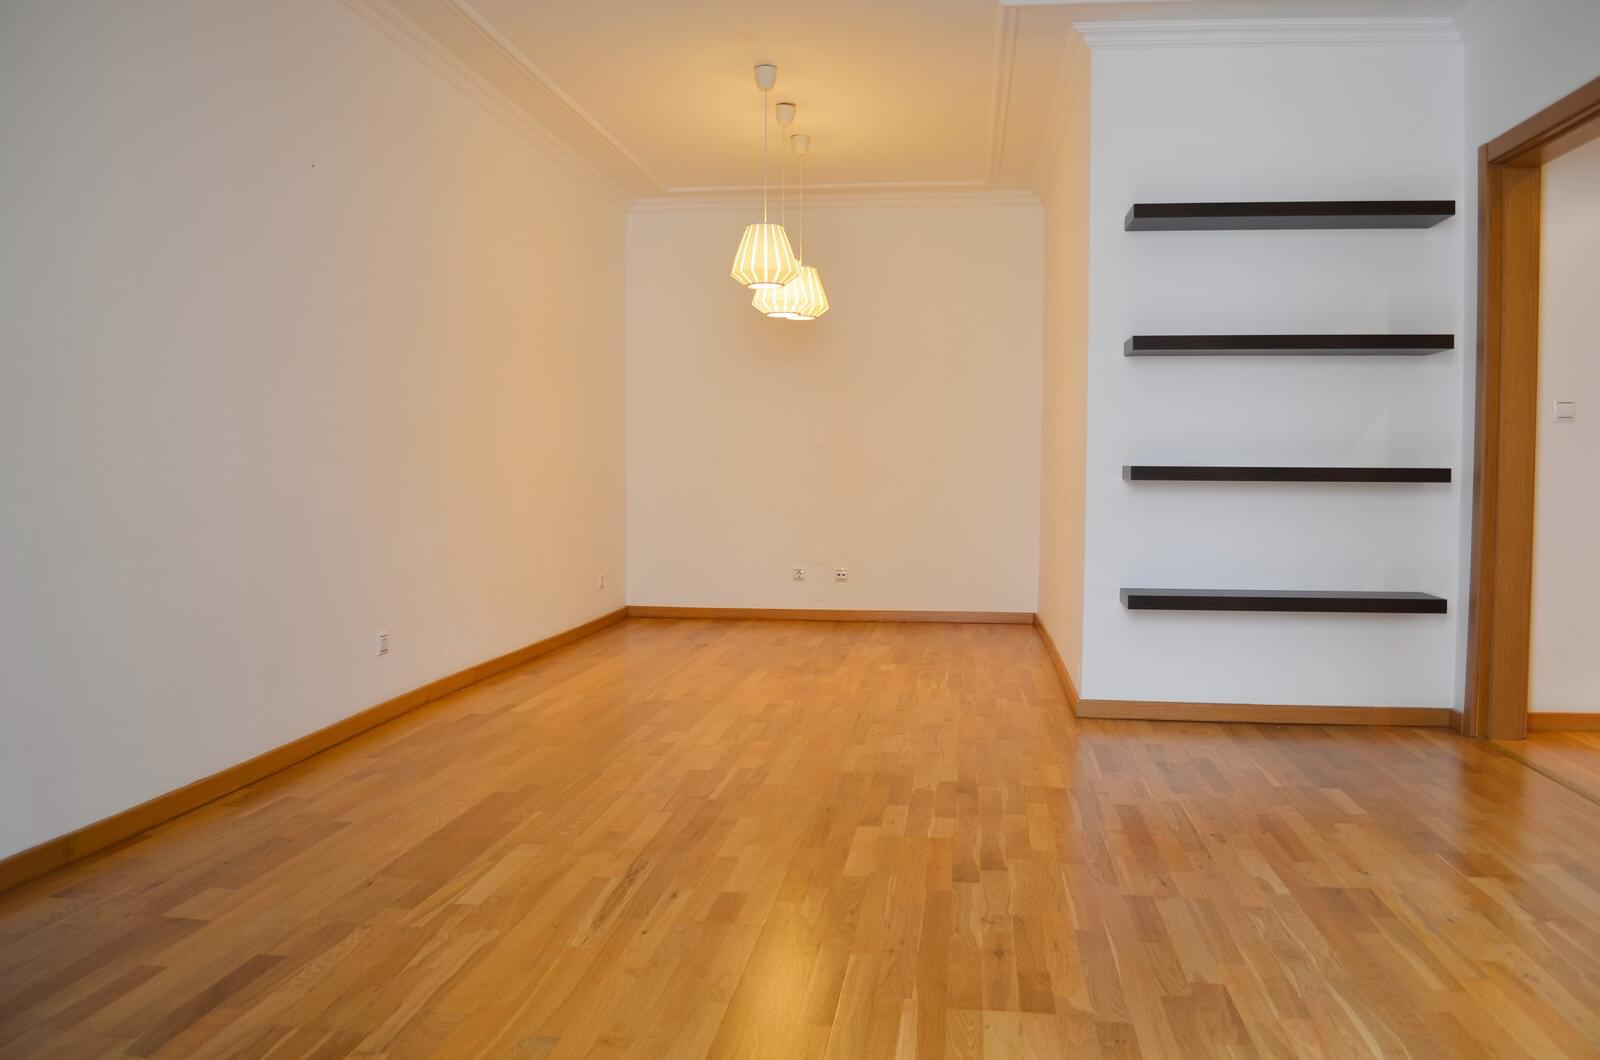 pf18839-apartamento-t2-lisboa-f7406ed1-896c-4a83-ac50-7c5a3a8e2e5f